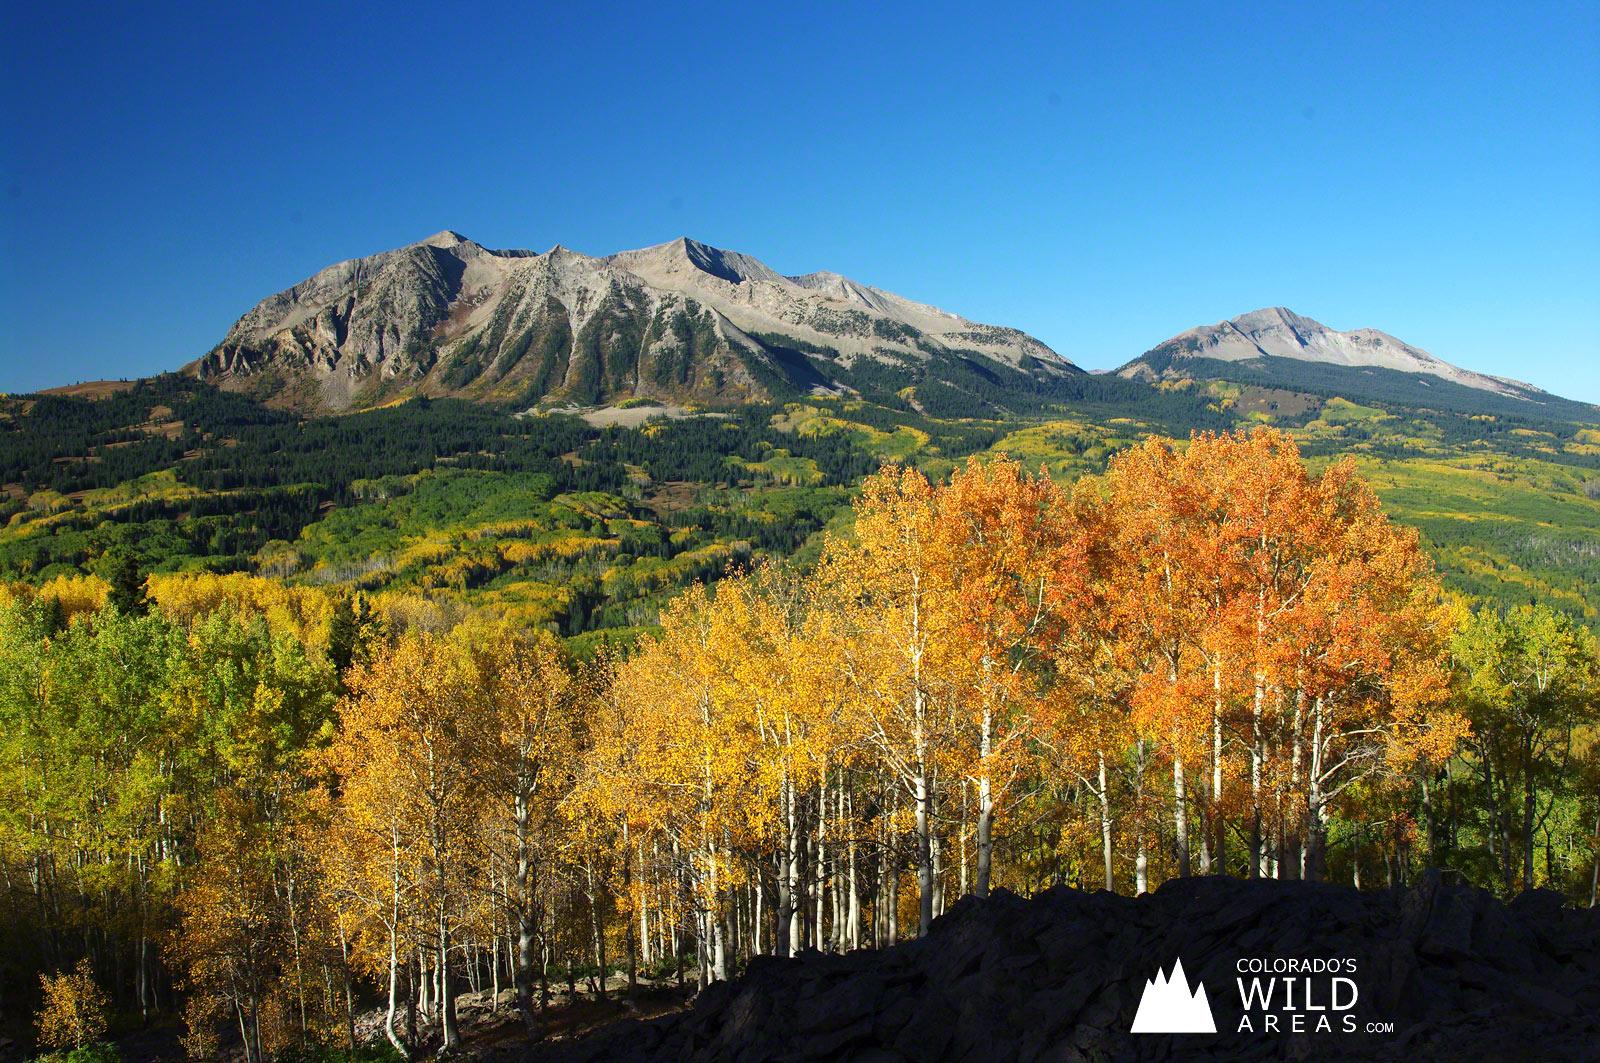 Colorado wallpaper screensavers wallpapersafari - Colorado wallpaper ...